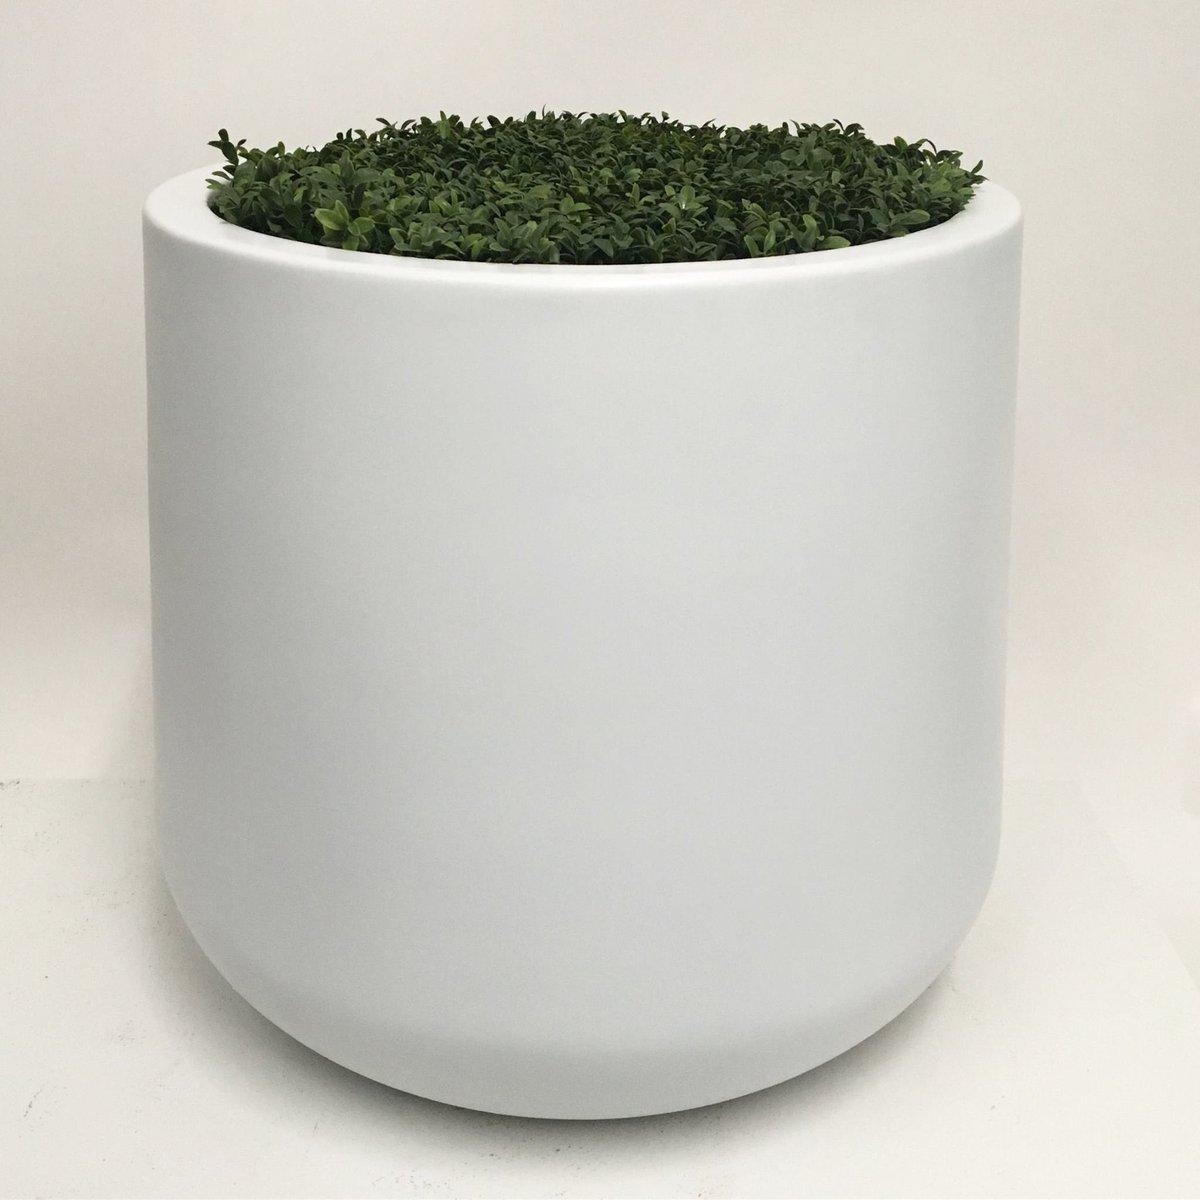 The #solo #planter brings a #soft #round #modern #organic presence to any #design scheme shown here in #matte #white • #hospitality #rooftop #garden #fiberglass #handmade #luxury #hoteldesign #hospitalitydesign